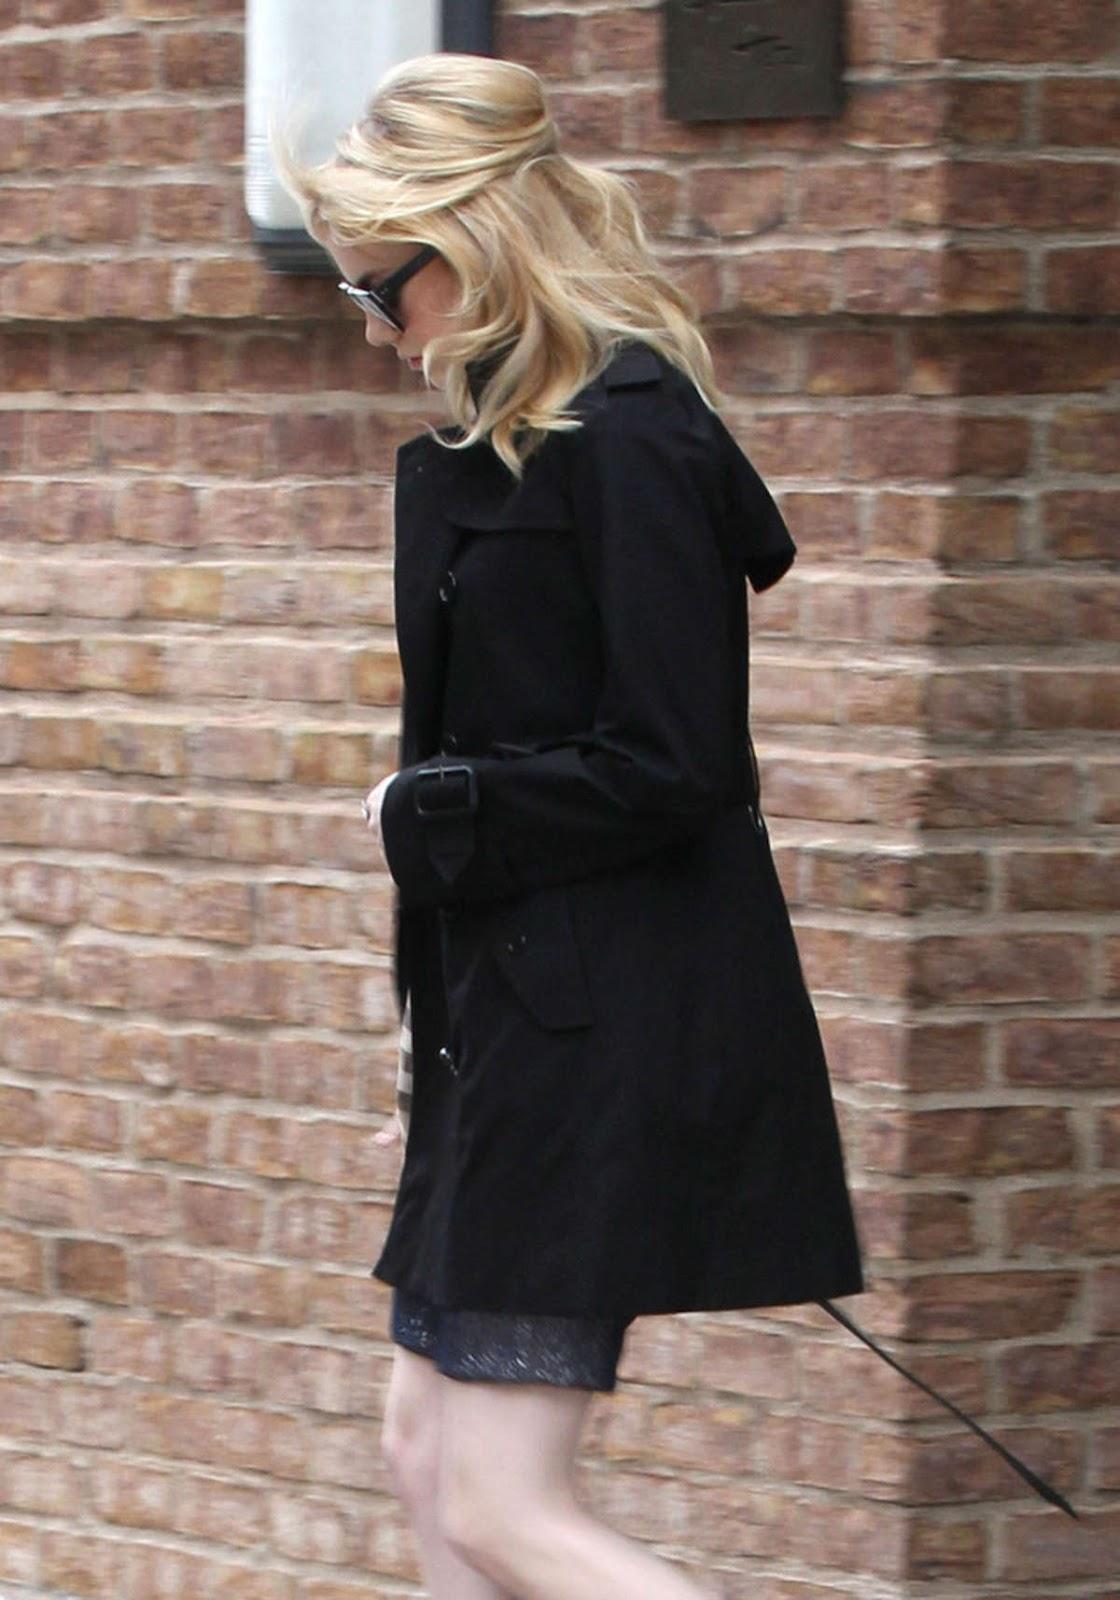 http://1.bp.blogspot.com/-2ZTq4jOo-LA/T-3IJiTTLBI/AAAAAAAAHxA/_wAZgb5dGcs/s1600/Emma+Stone+Candids+-+Leaving+Her+Hotel+In+New+York+02.jpg